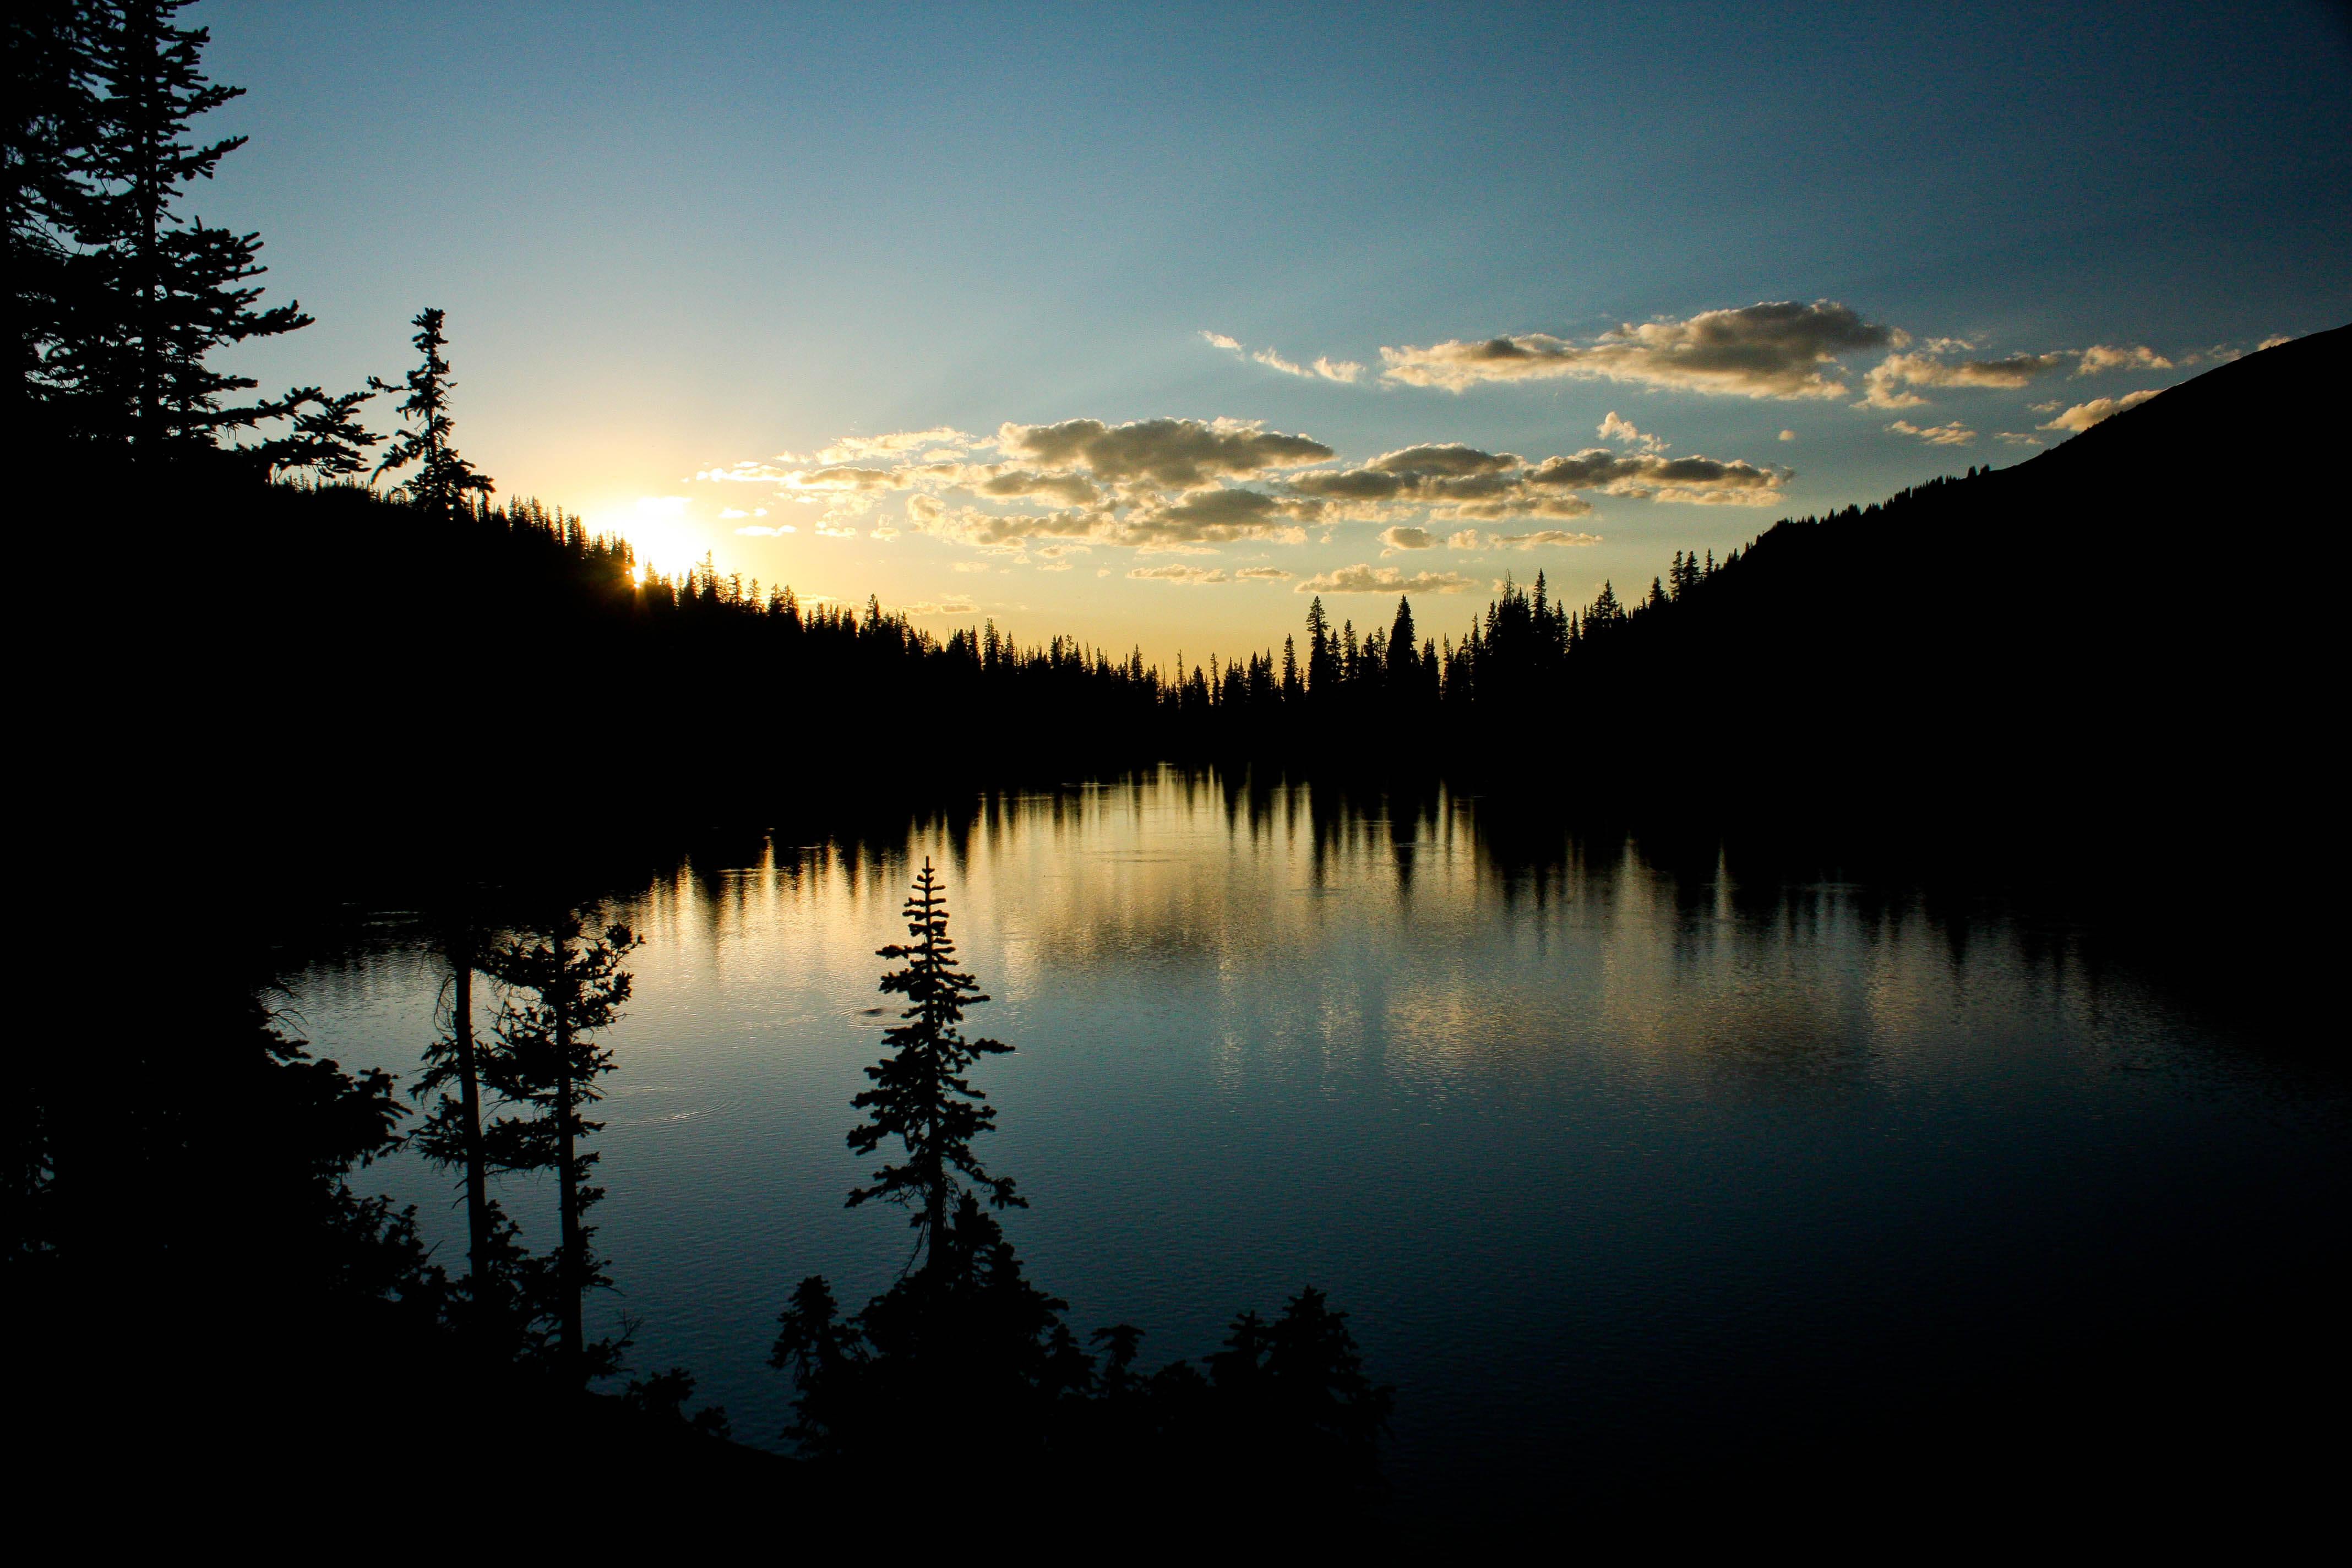 Lake charles 2